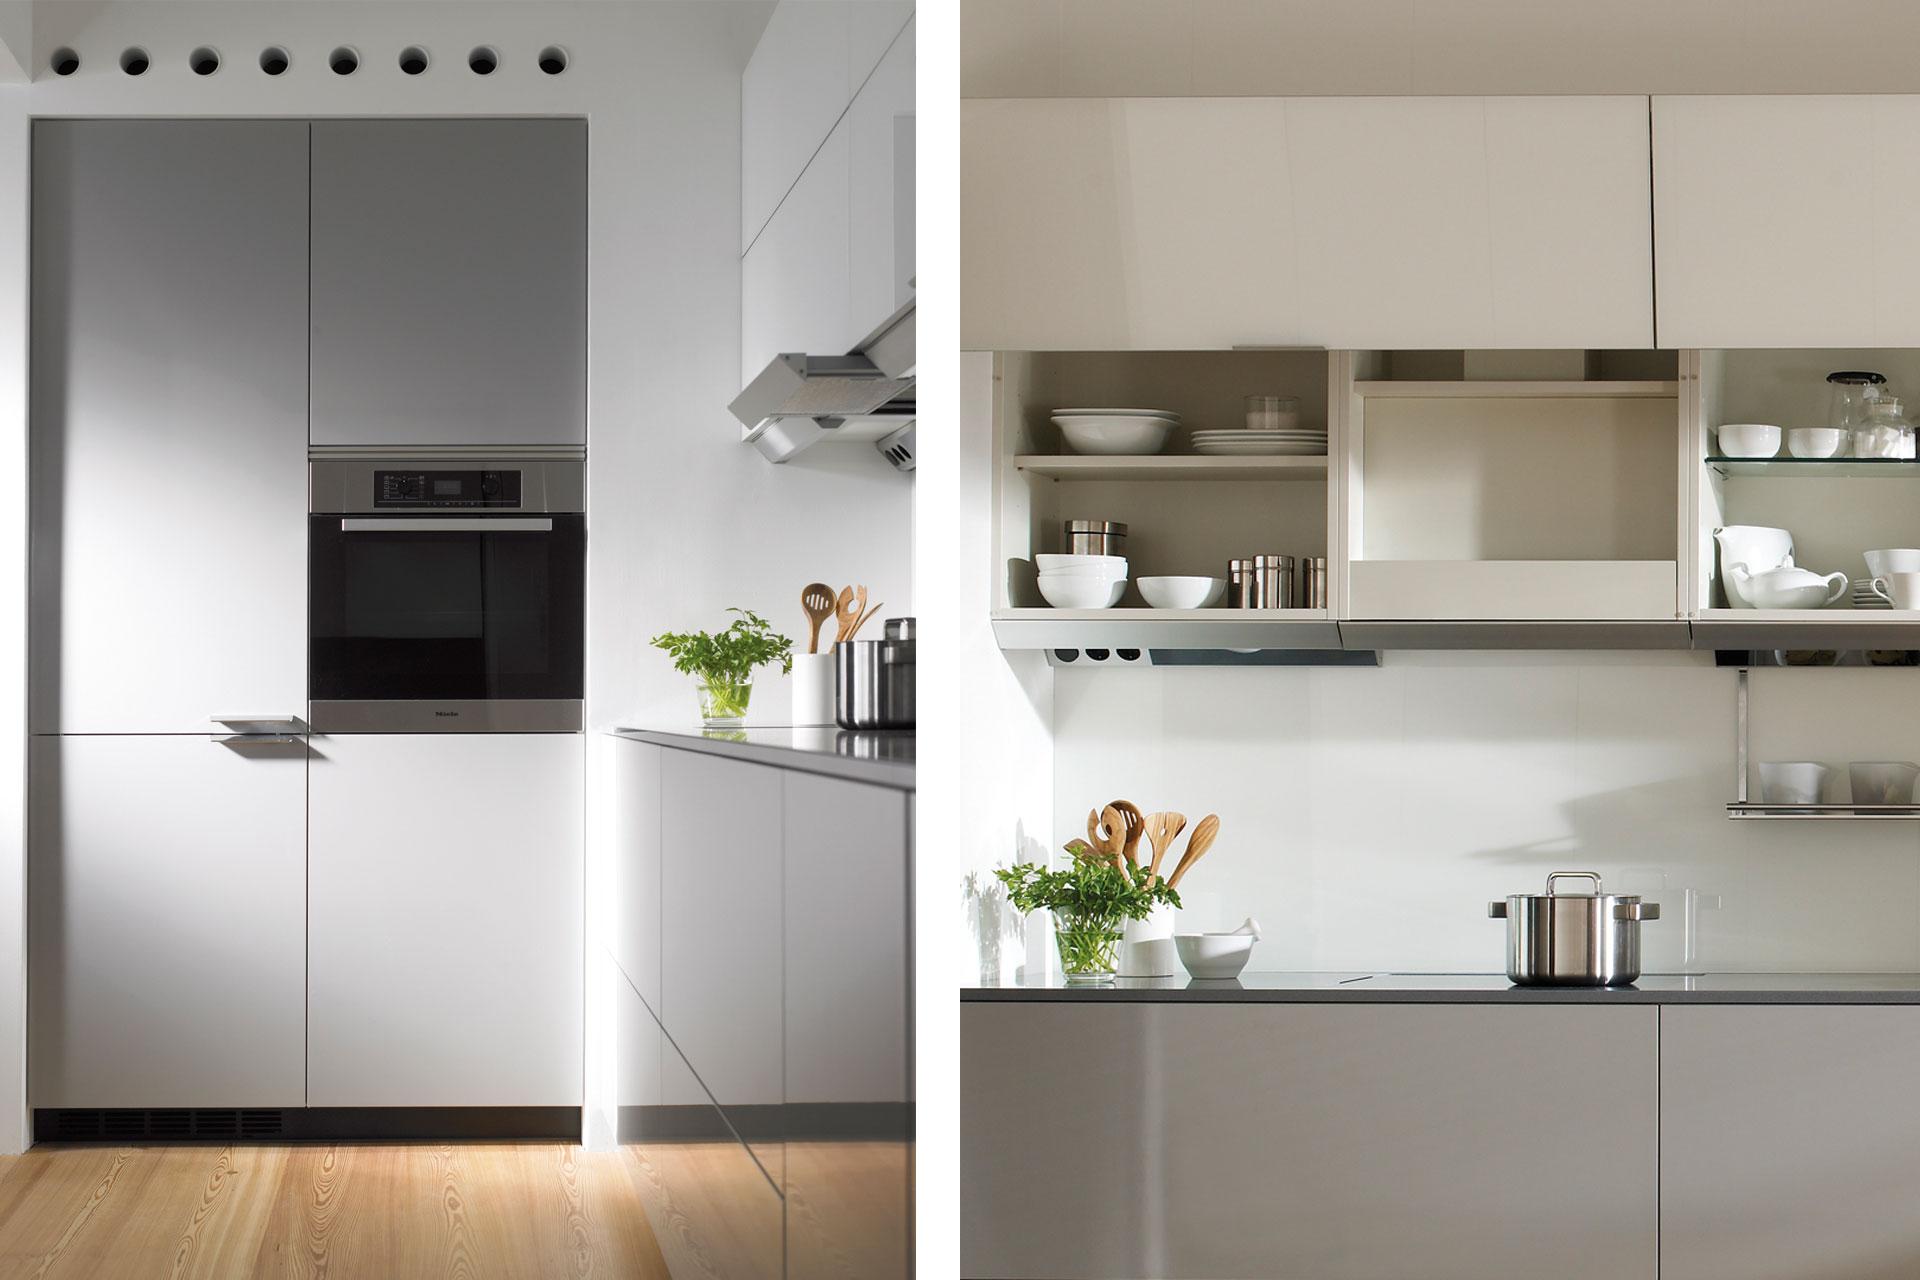 Electrodom sticos integrados santiago interiores cocinas santos - Cocinas completas con electrodomesticos ...